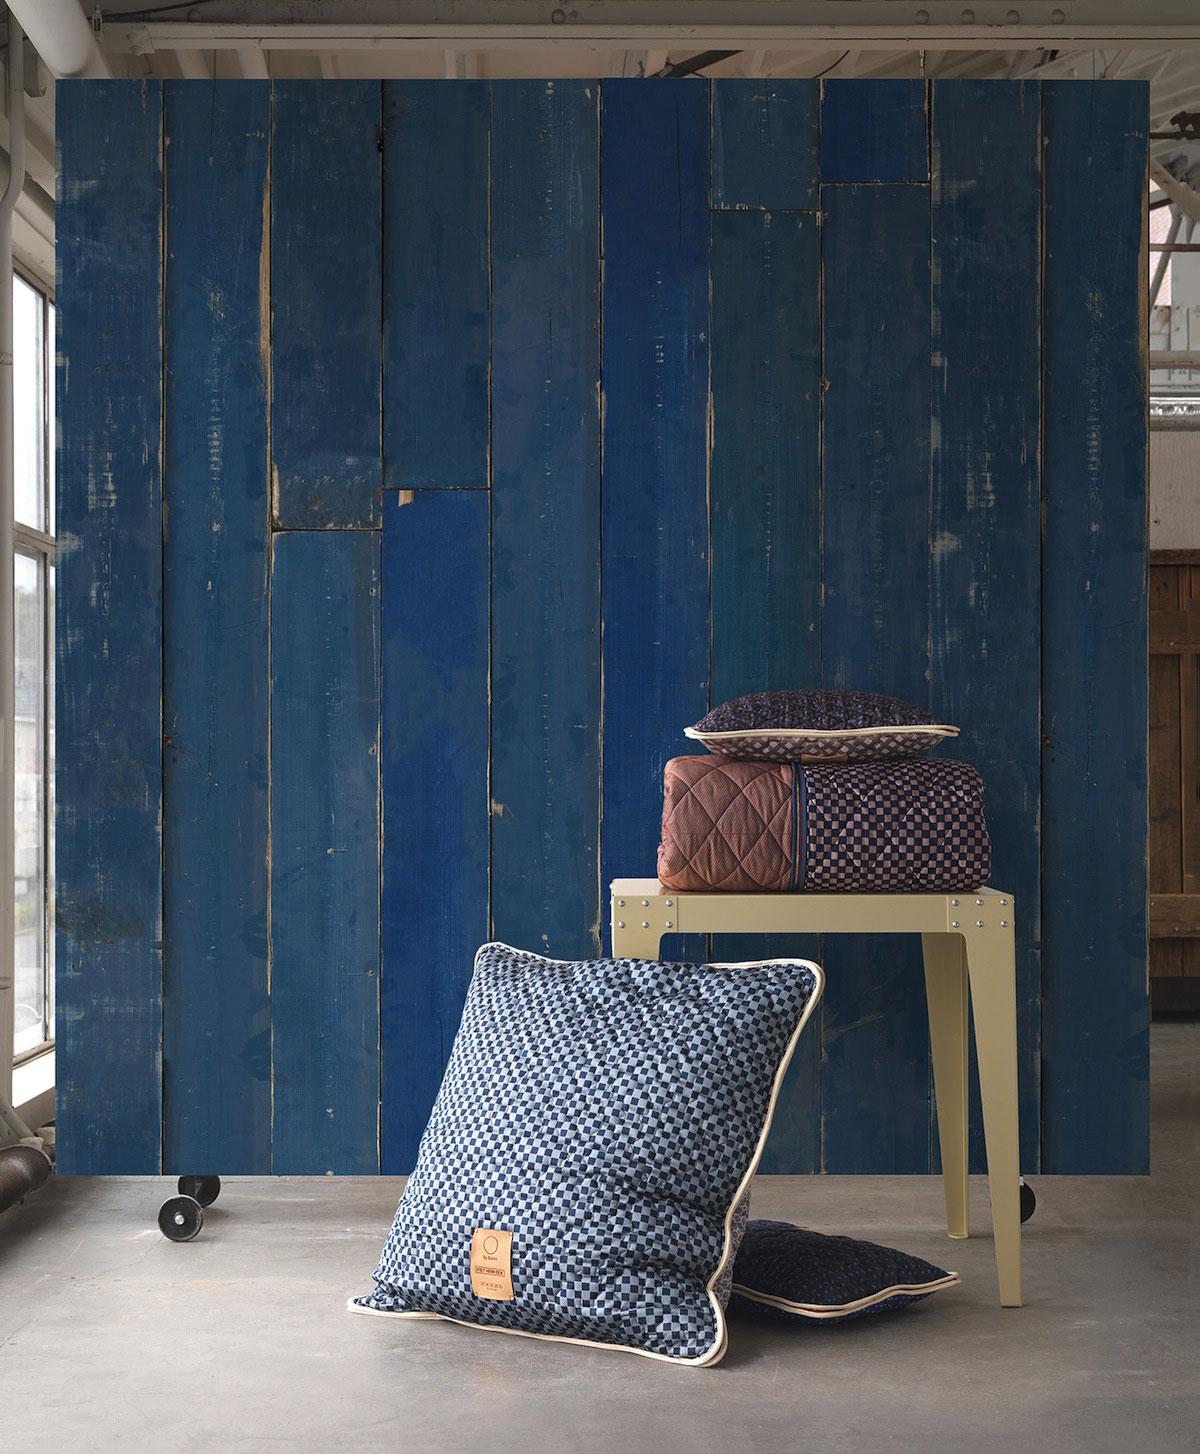 Blue-Scrapwood-by-Piet-Hein-Eek-and-NLXL-wallpaper-wp4405227